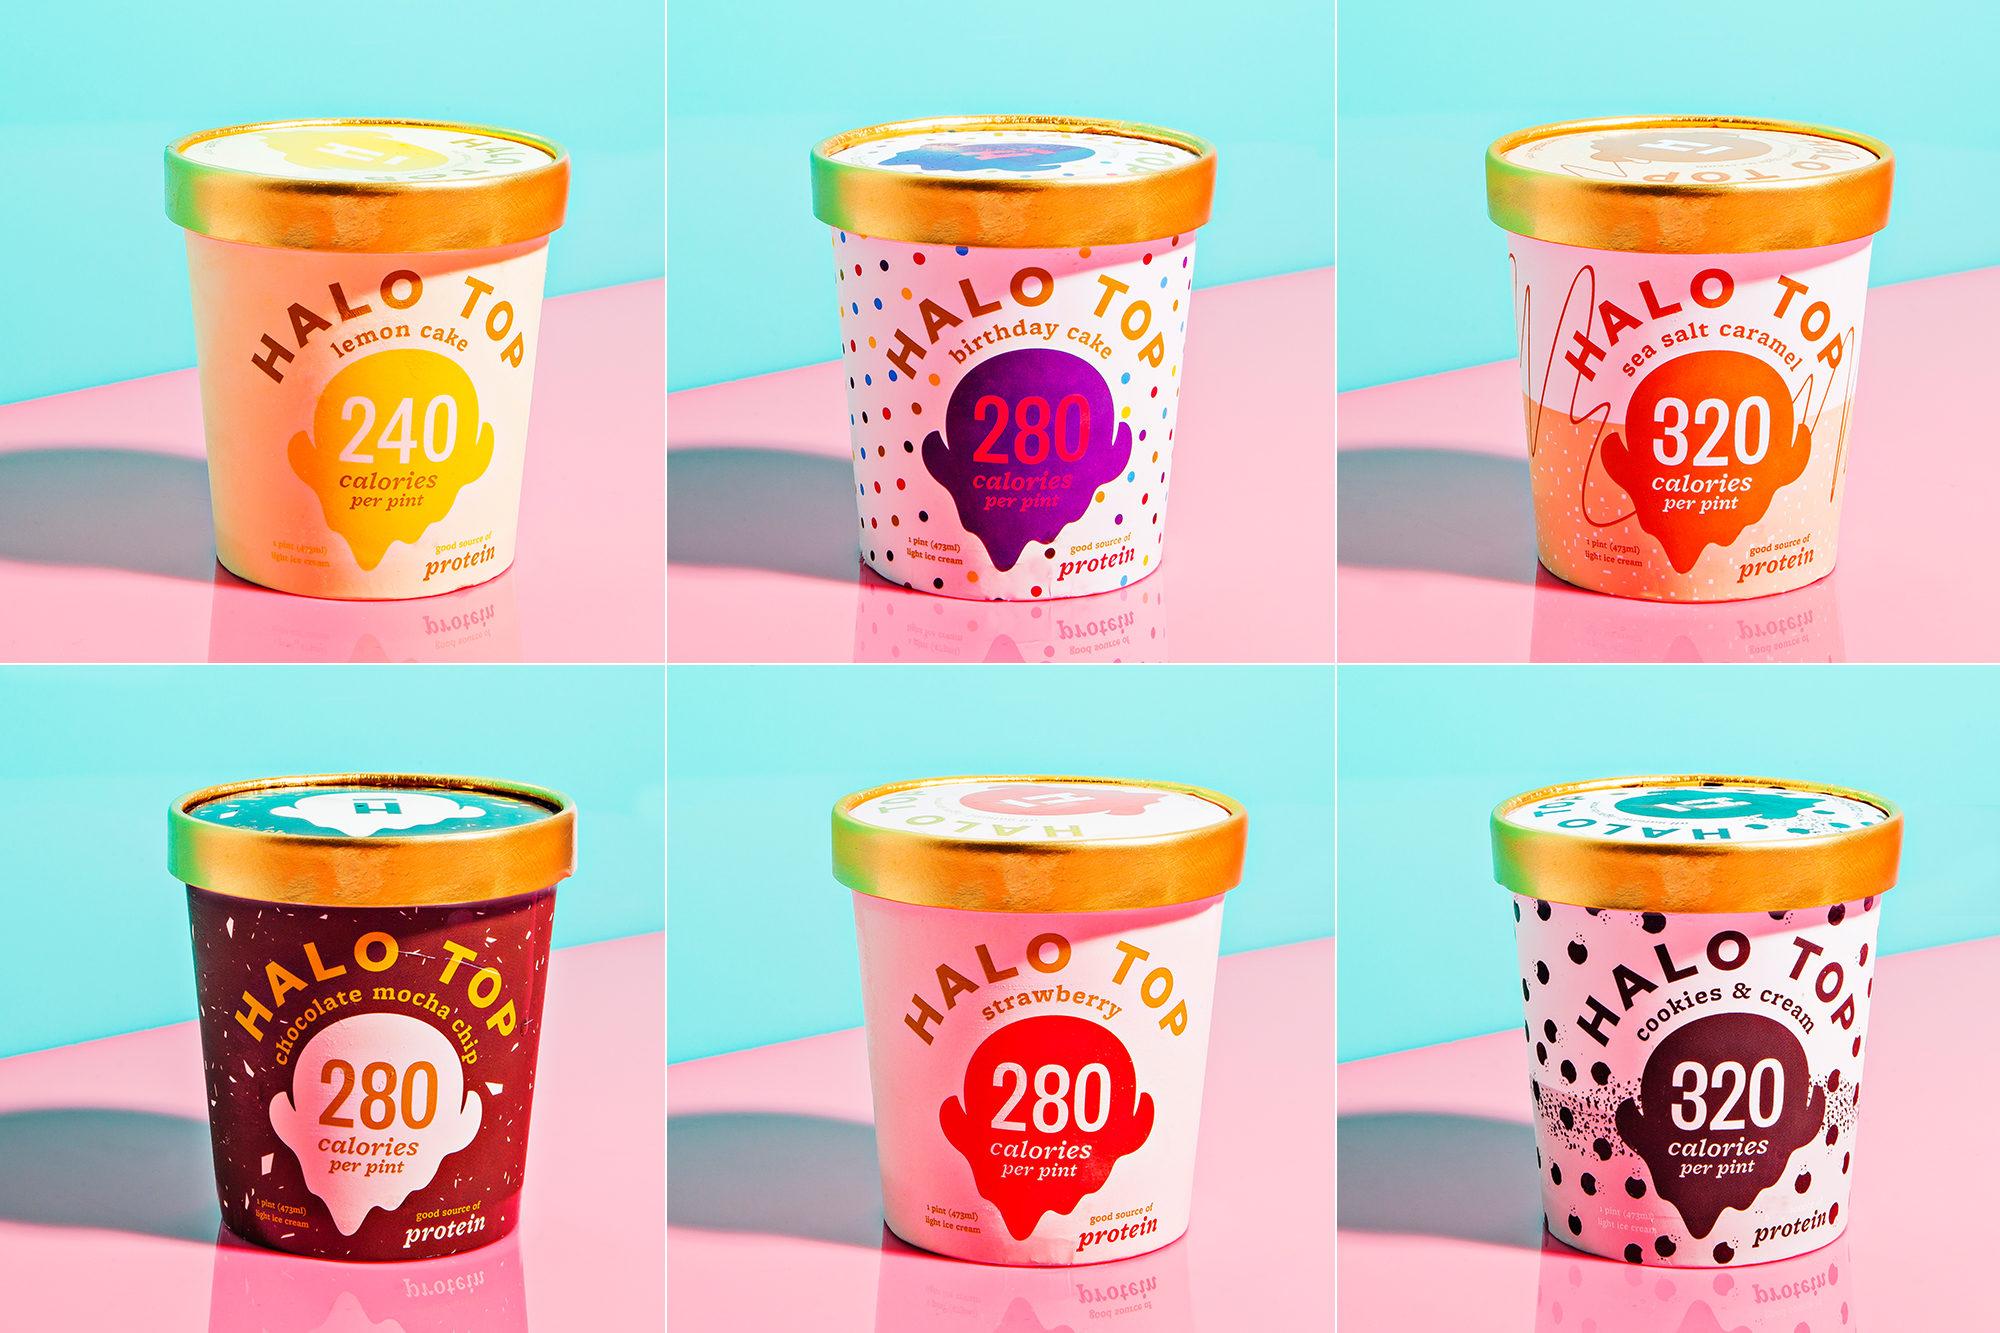 Article Halo Top Ice Cream